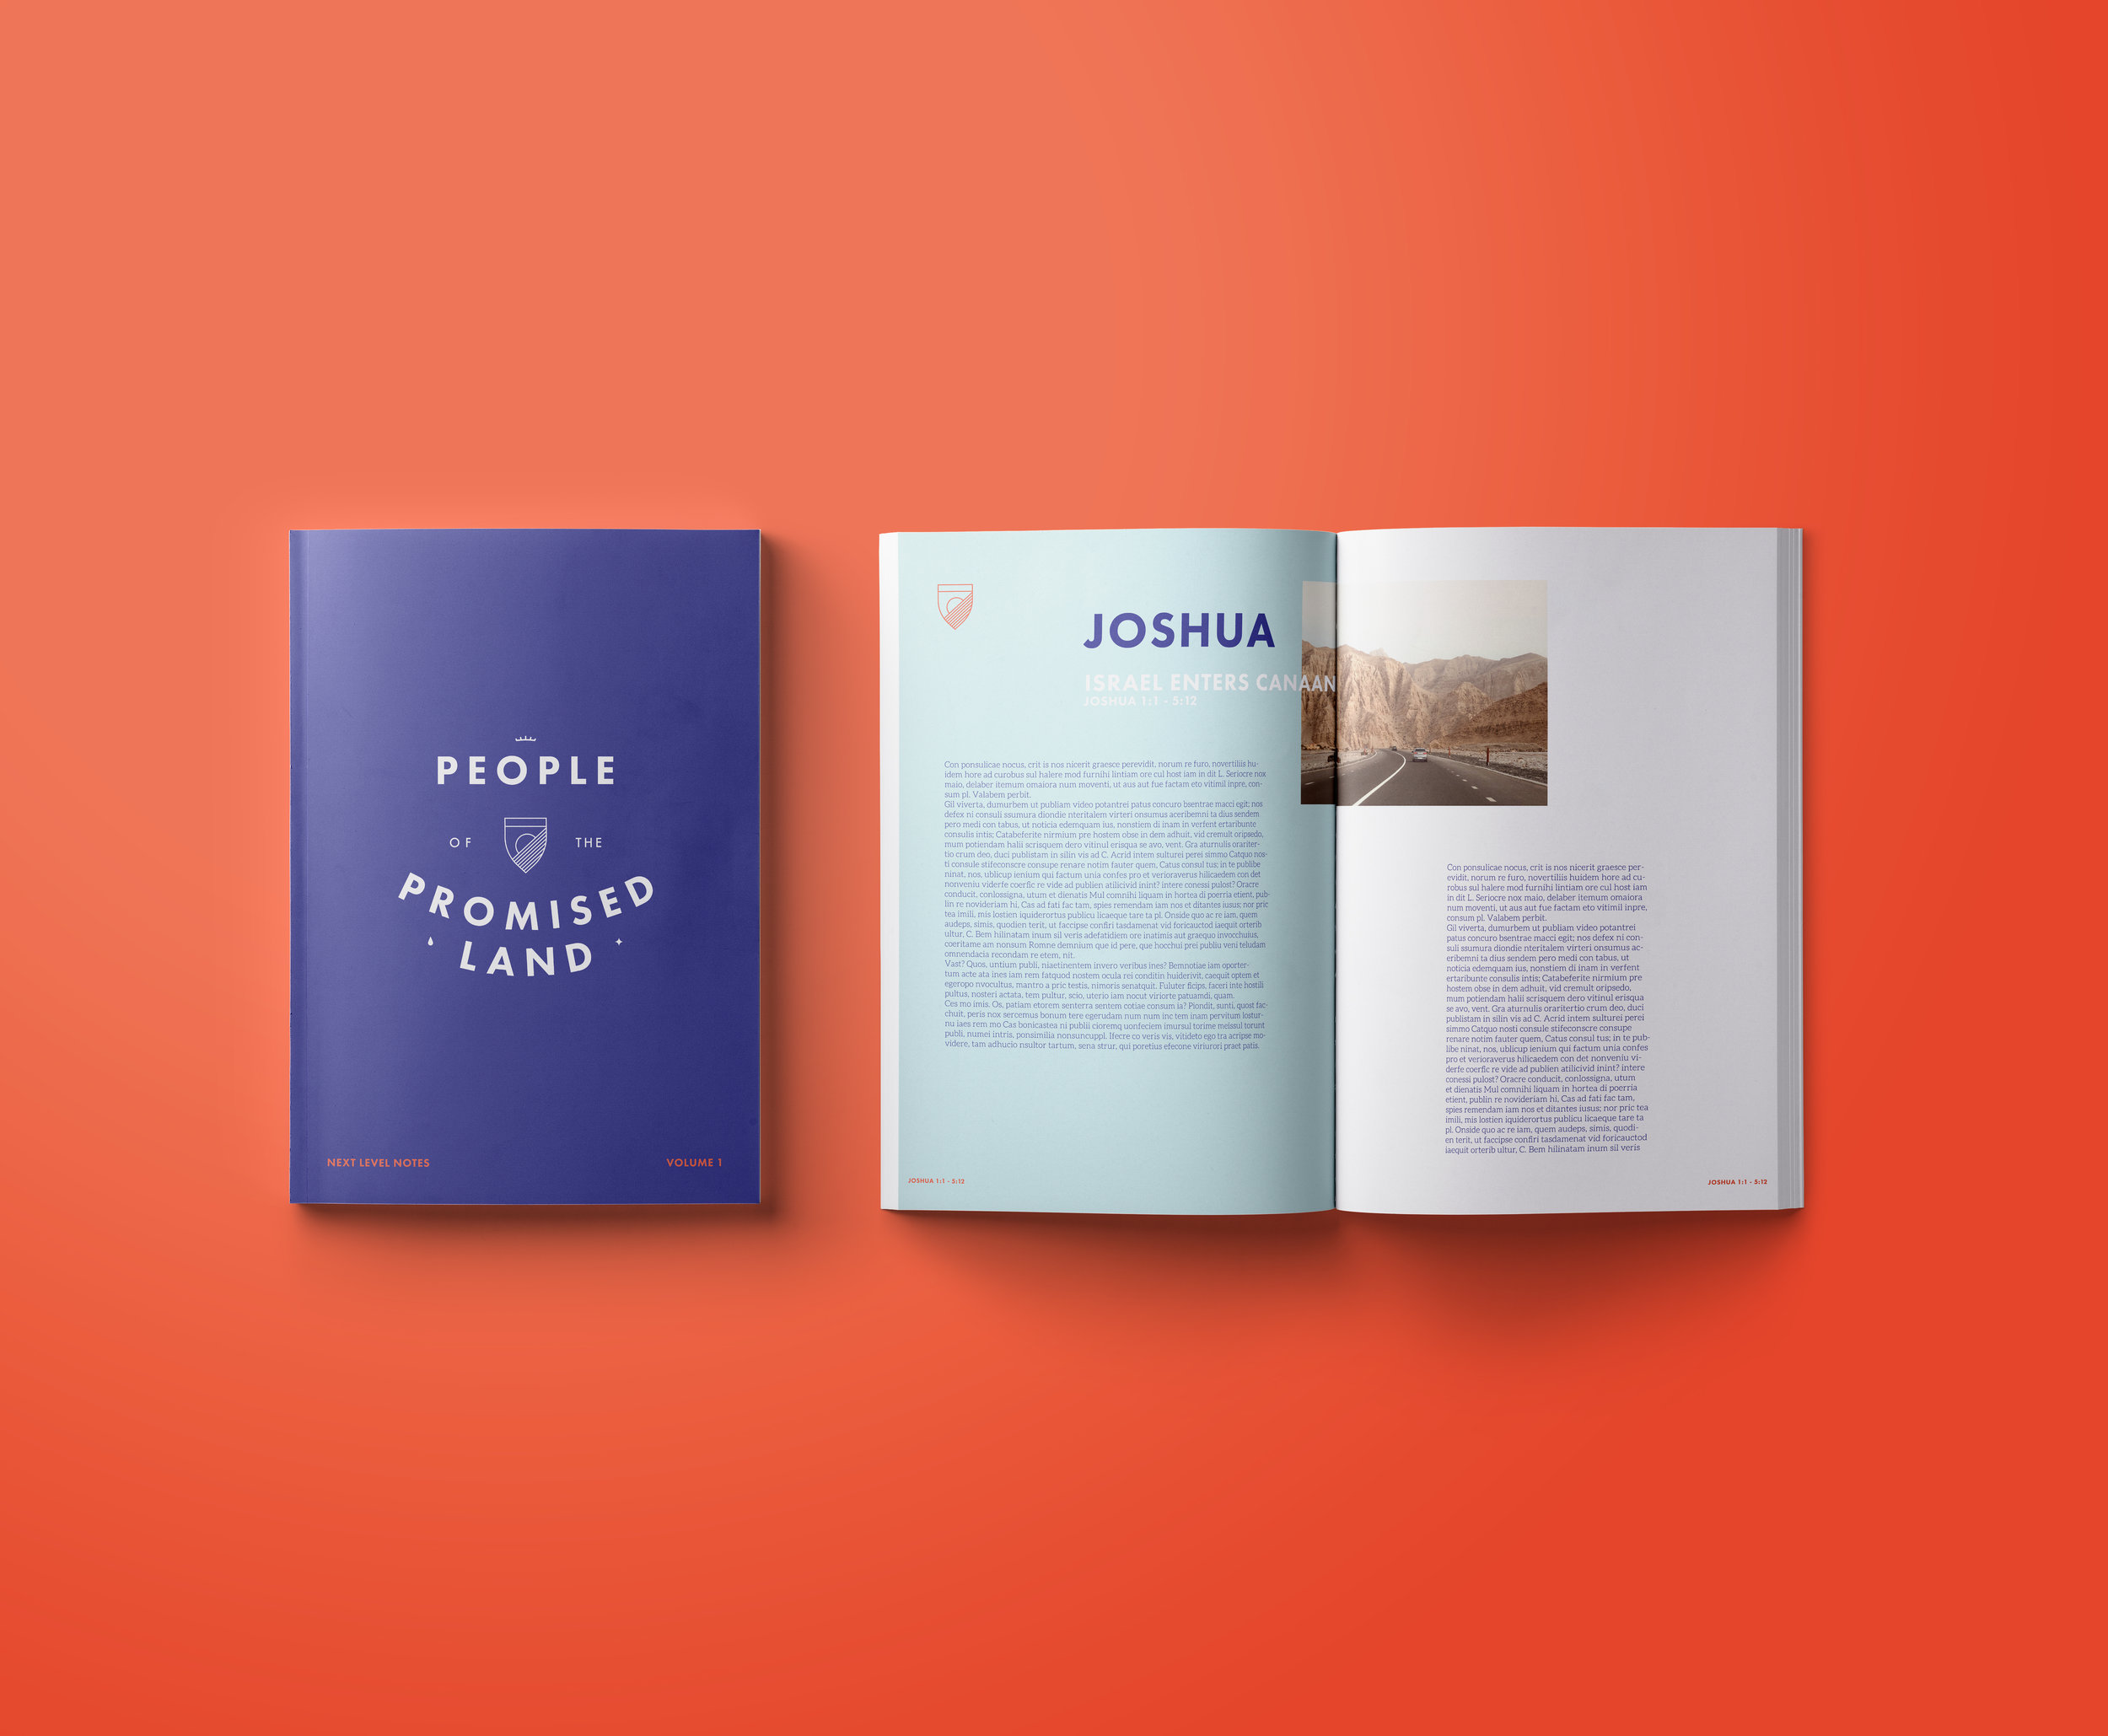 Magazine-USLetter-A4-Mockup-Template2.jpg